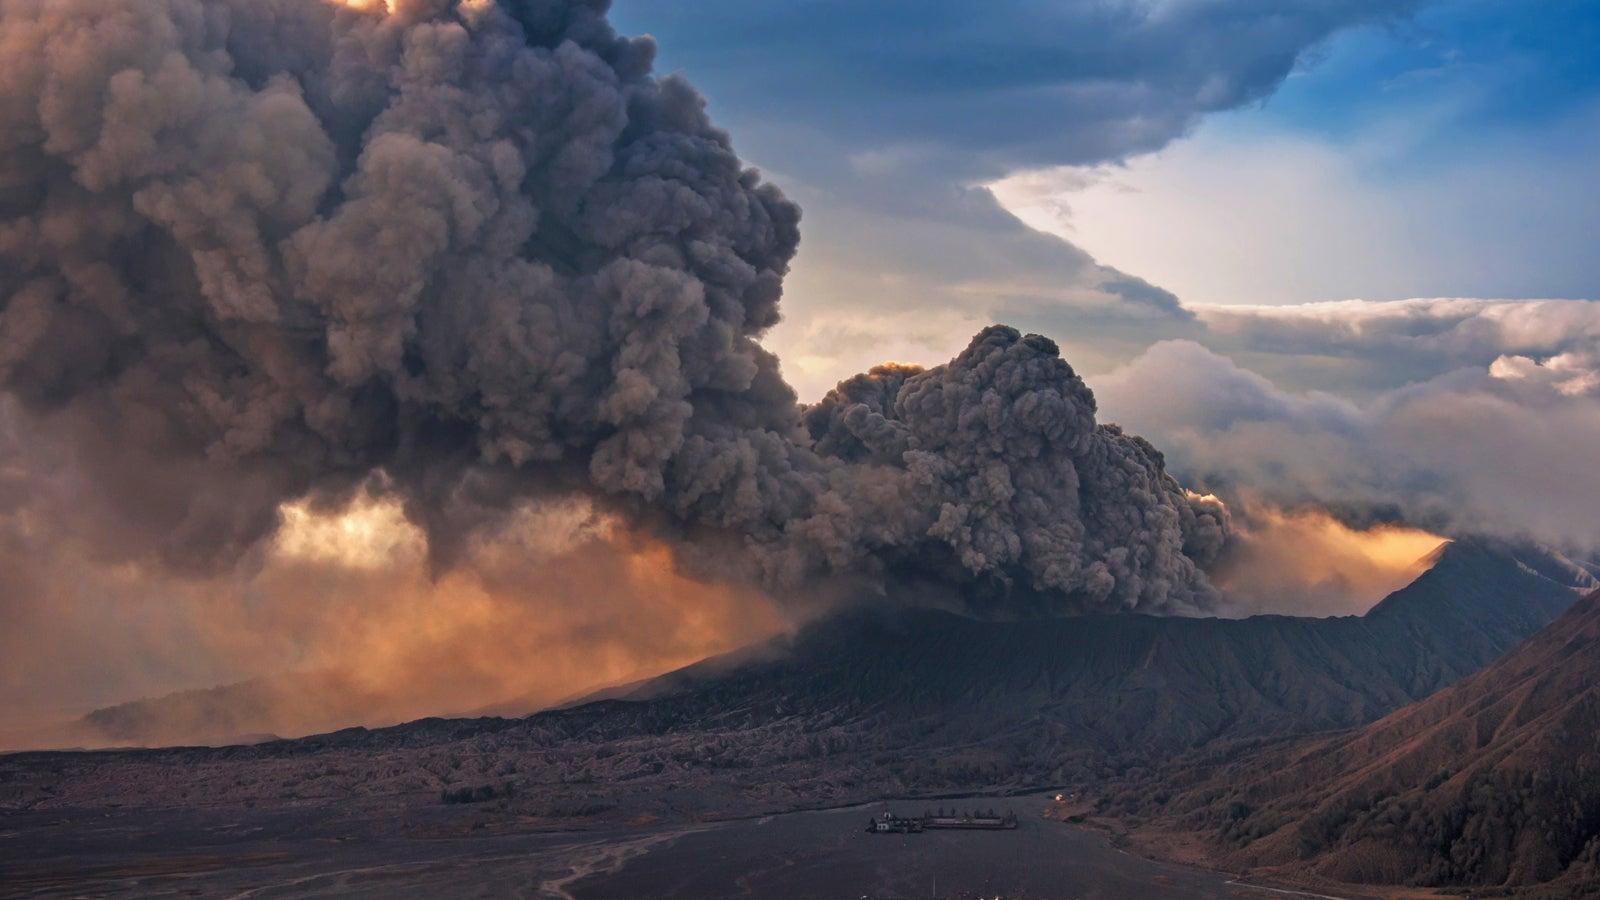 So kommt es zum Vulkanausbruch